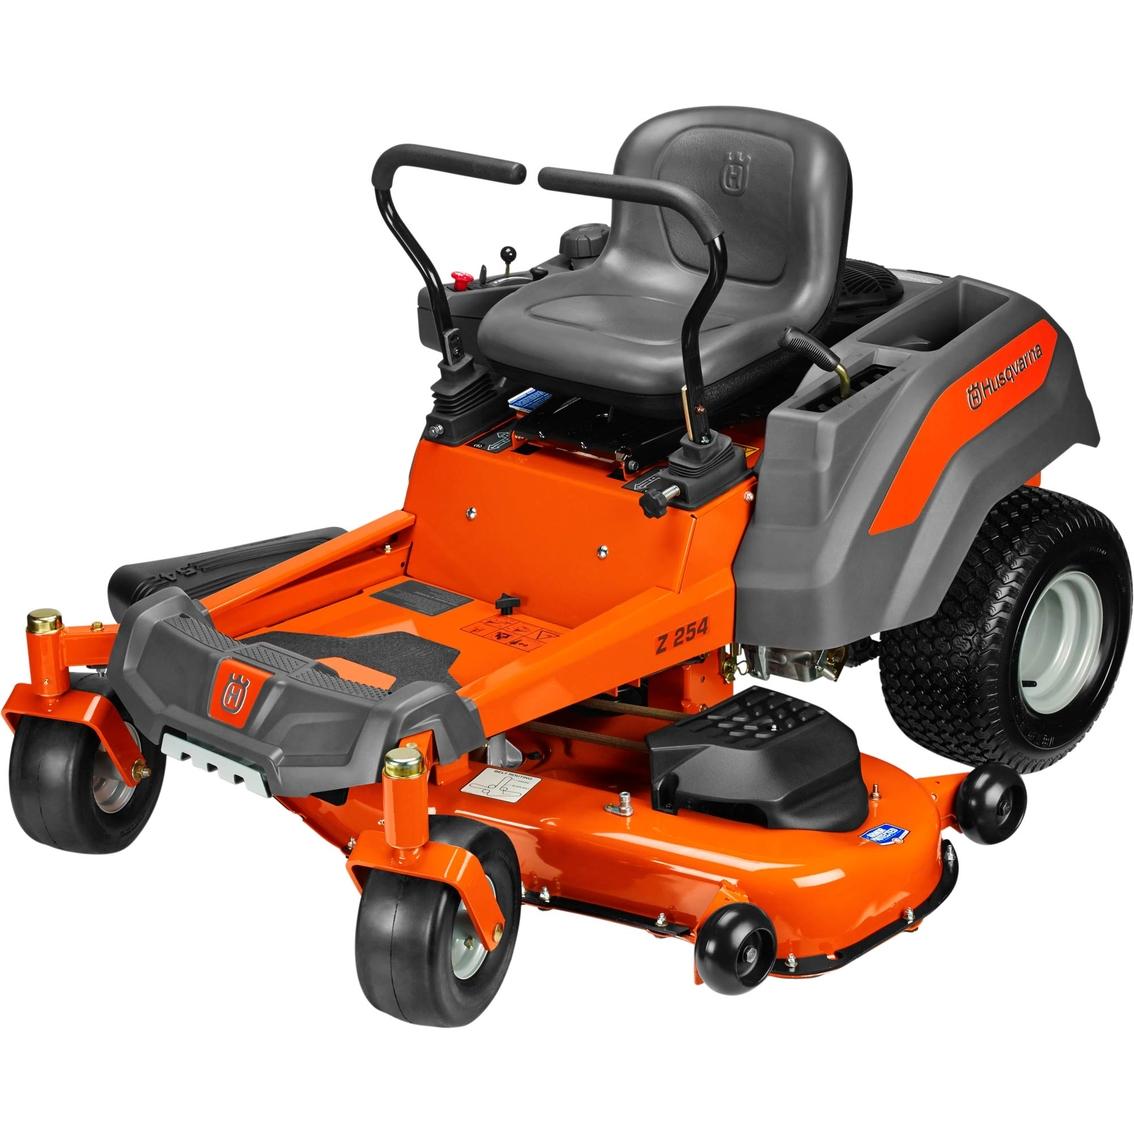 Husqvarna Z254 26 Hp Kohler 54 In Zero Turn Lawn Mower Mowers Patio Garden Garage Shop The Exchange